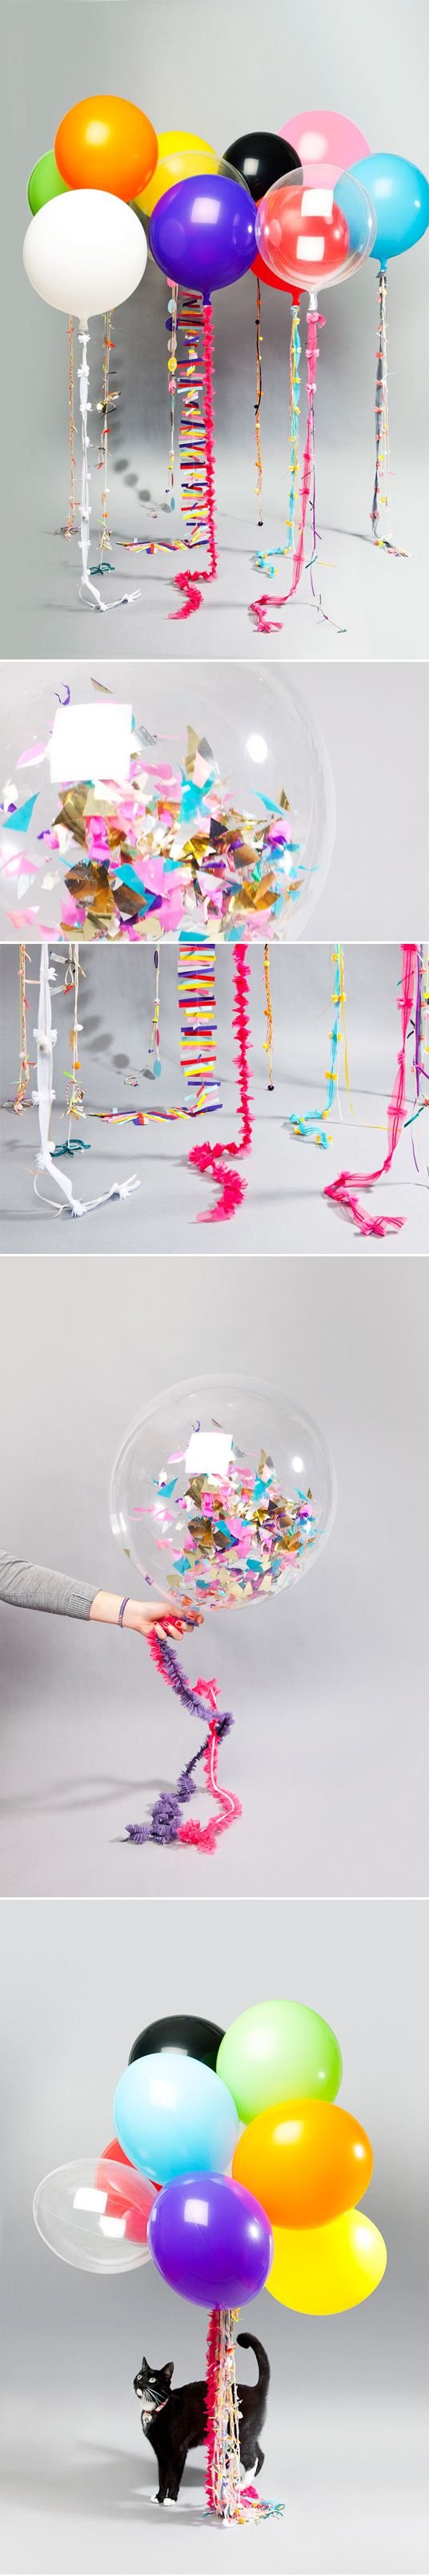 Gorgeous balloon alterations